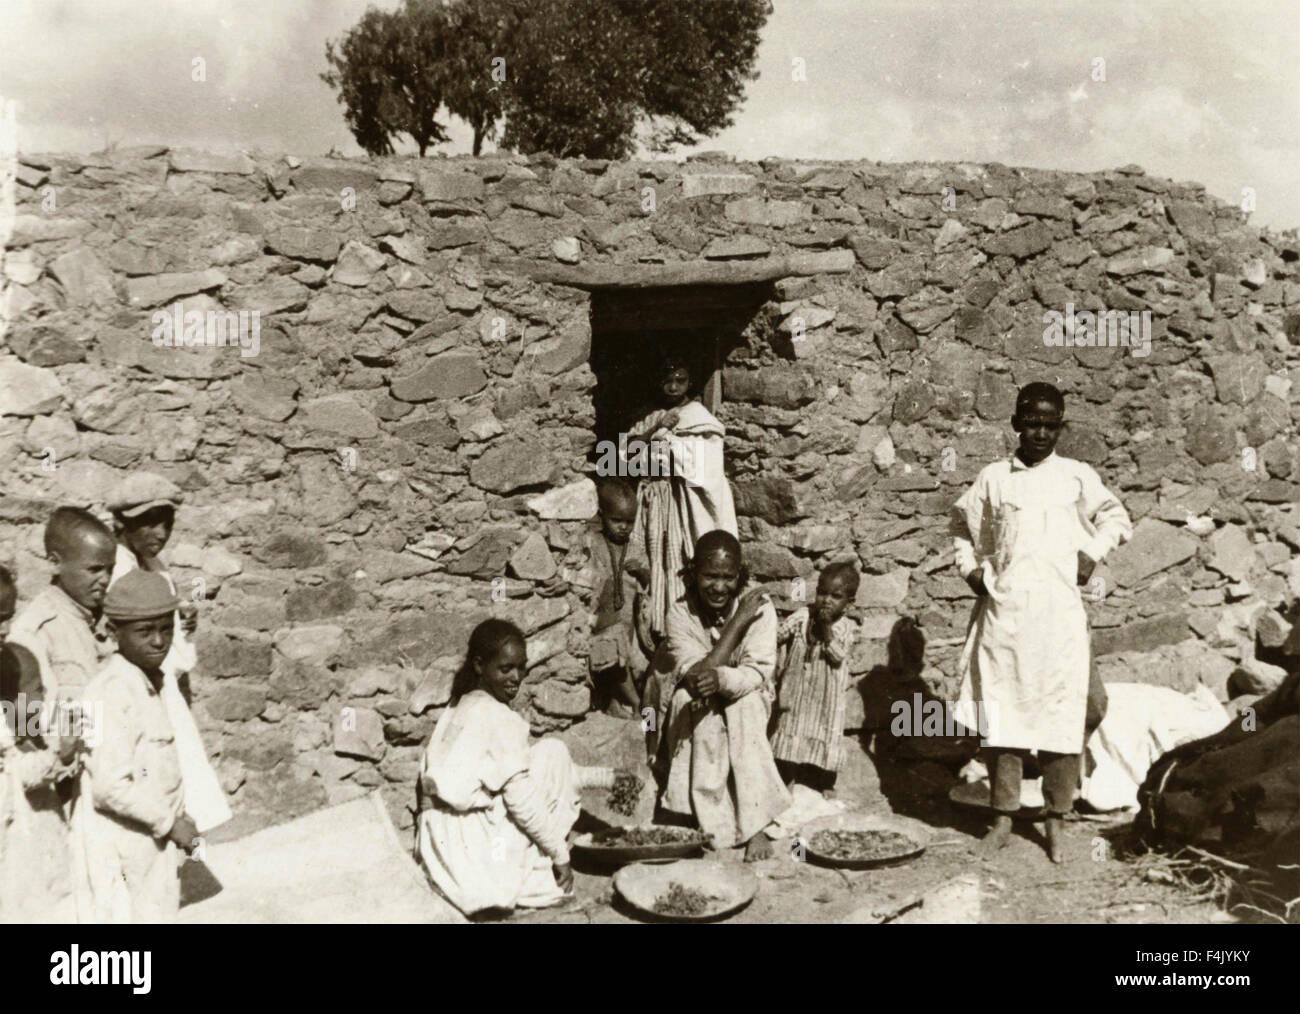 Grupo de negros en una aldea africana Imagen De Stock